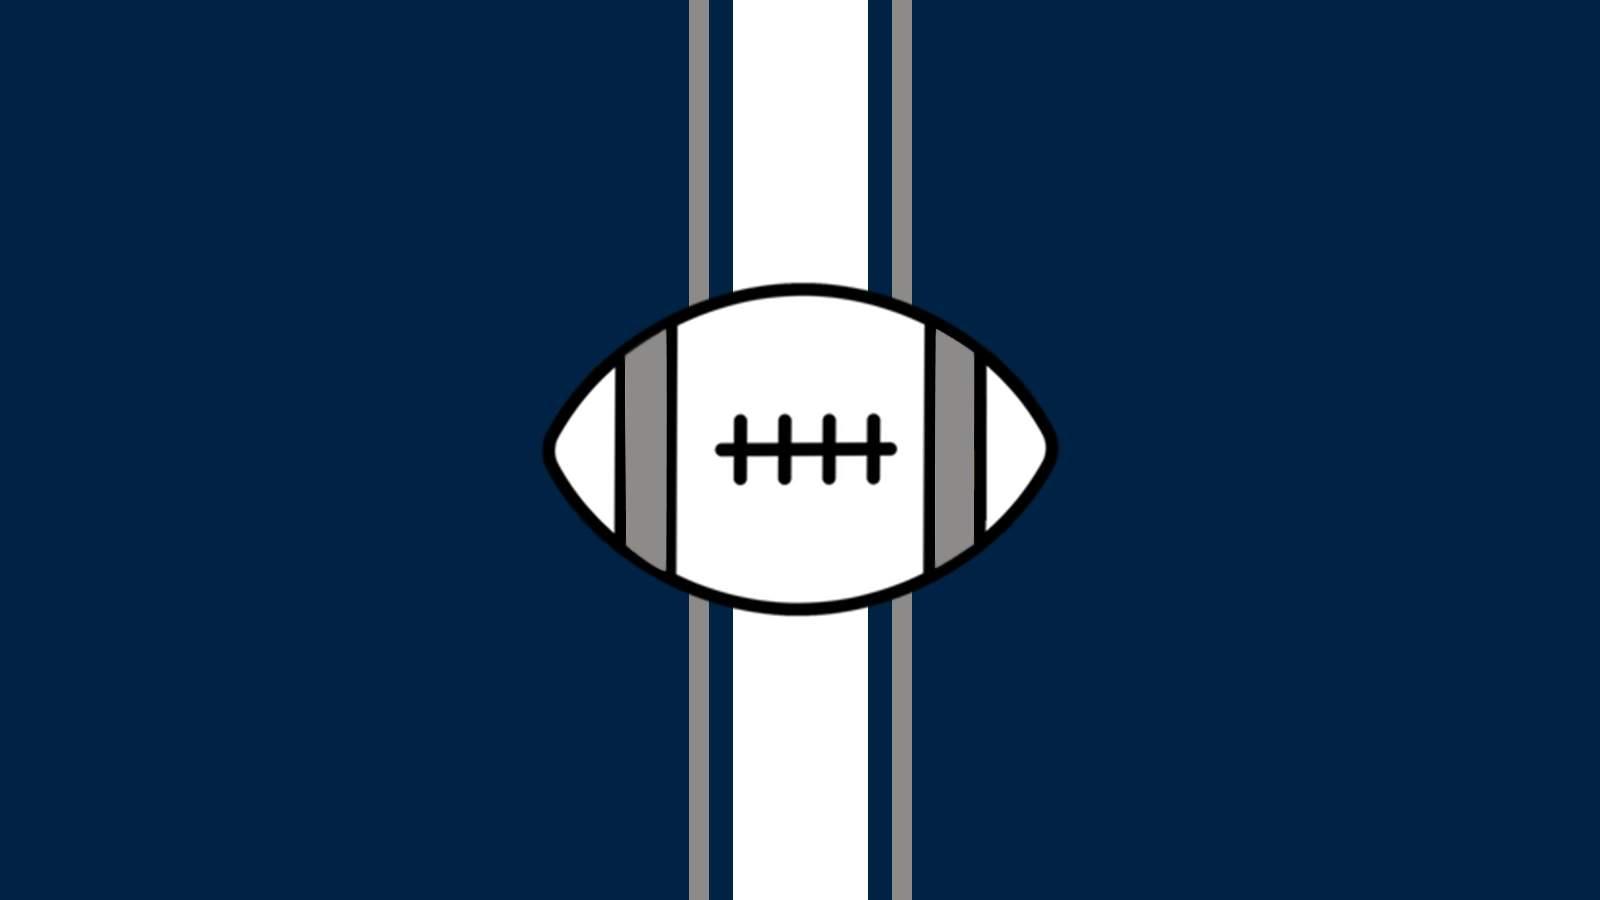 Pittsburgh Steelers at Dallas Cowboys (Reduced Capacity, Social Distancing)